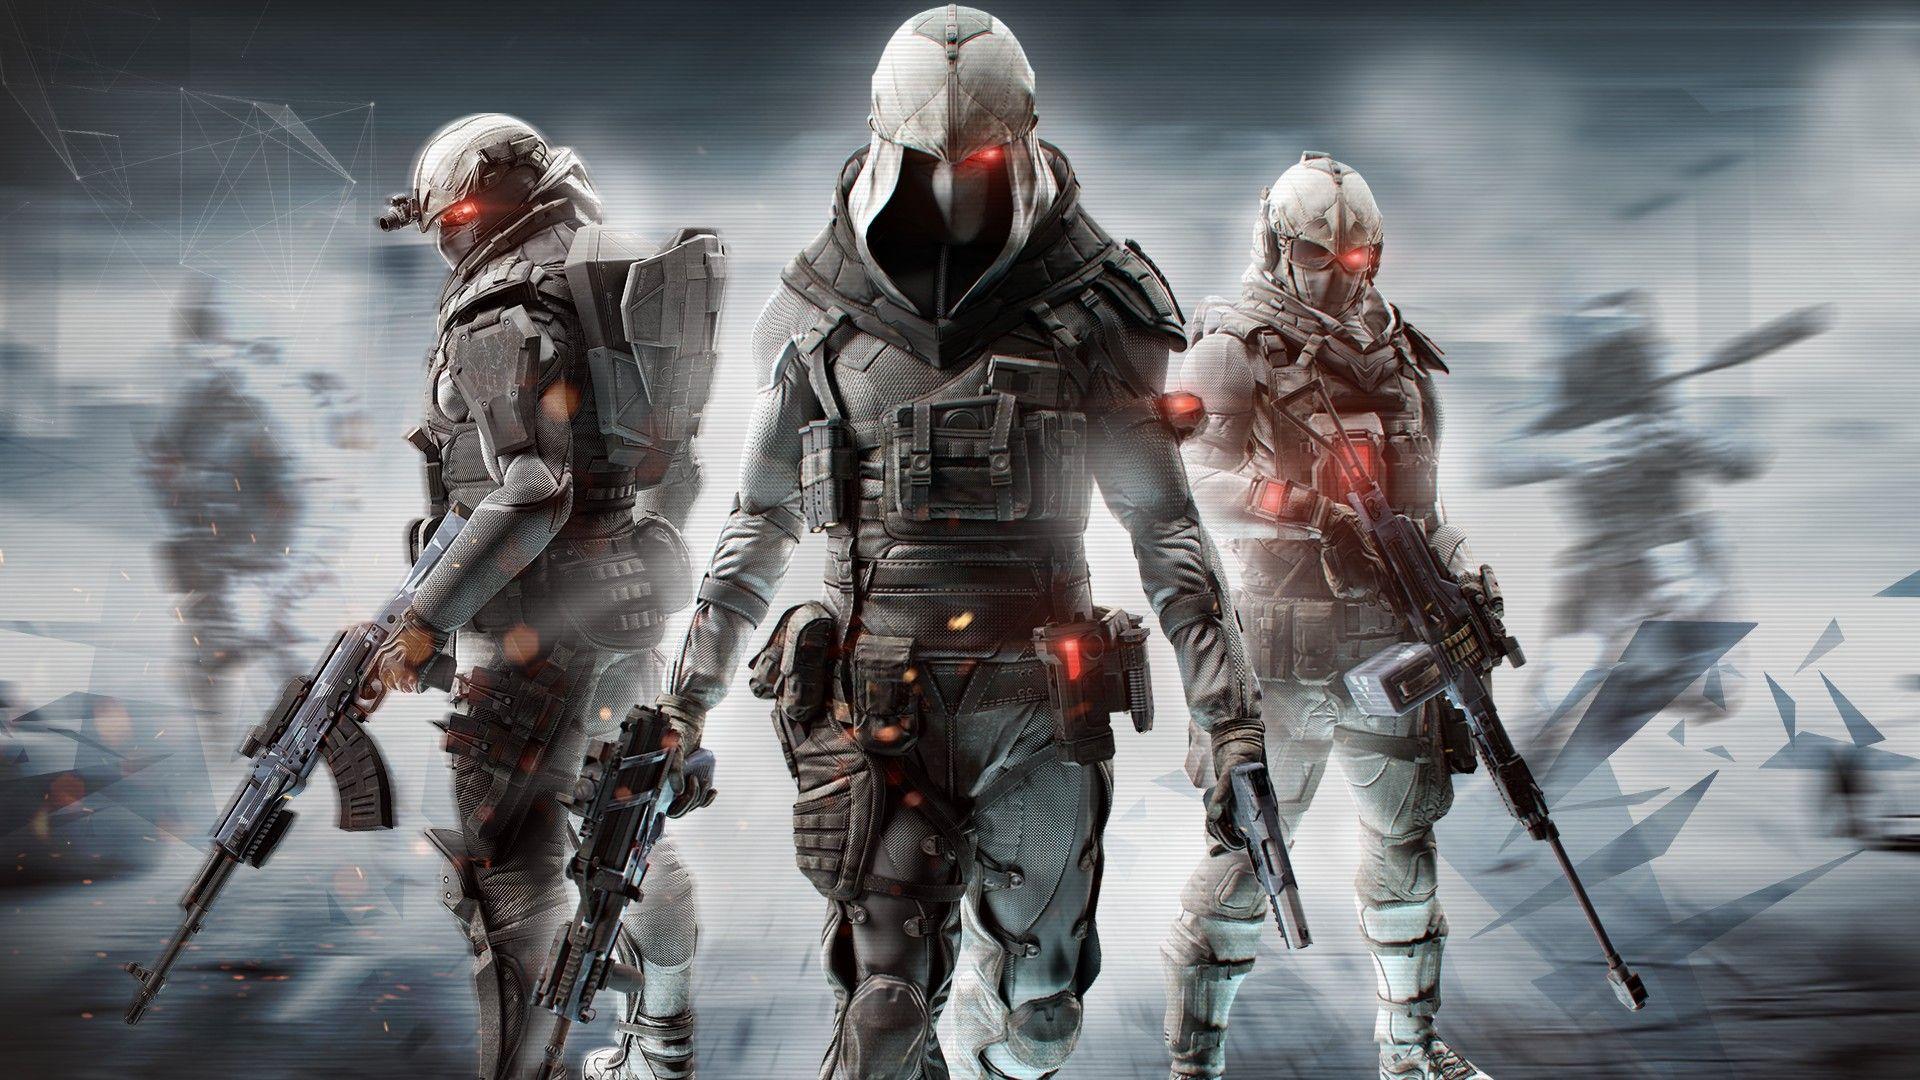 Video Game - Tom Clancy's Ghost Recon Phantoms Wallpaper | Video ...